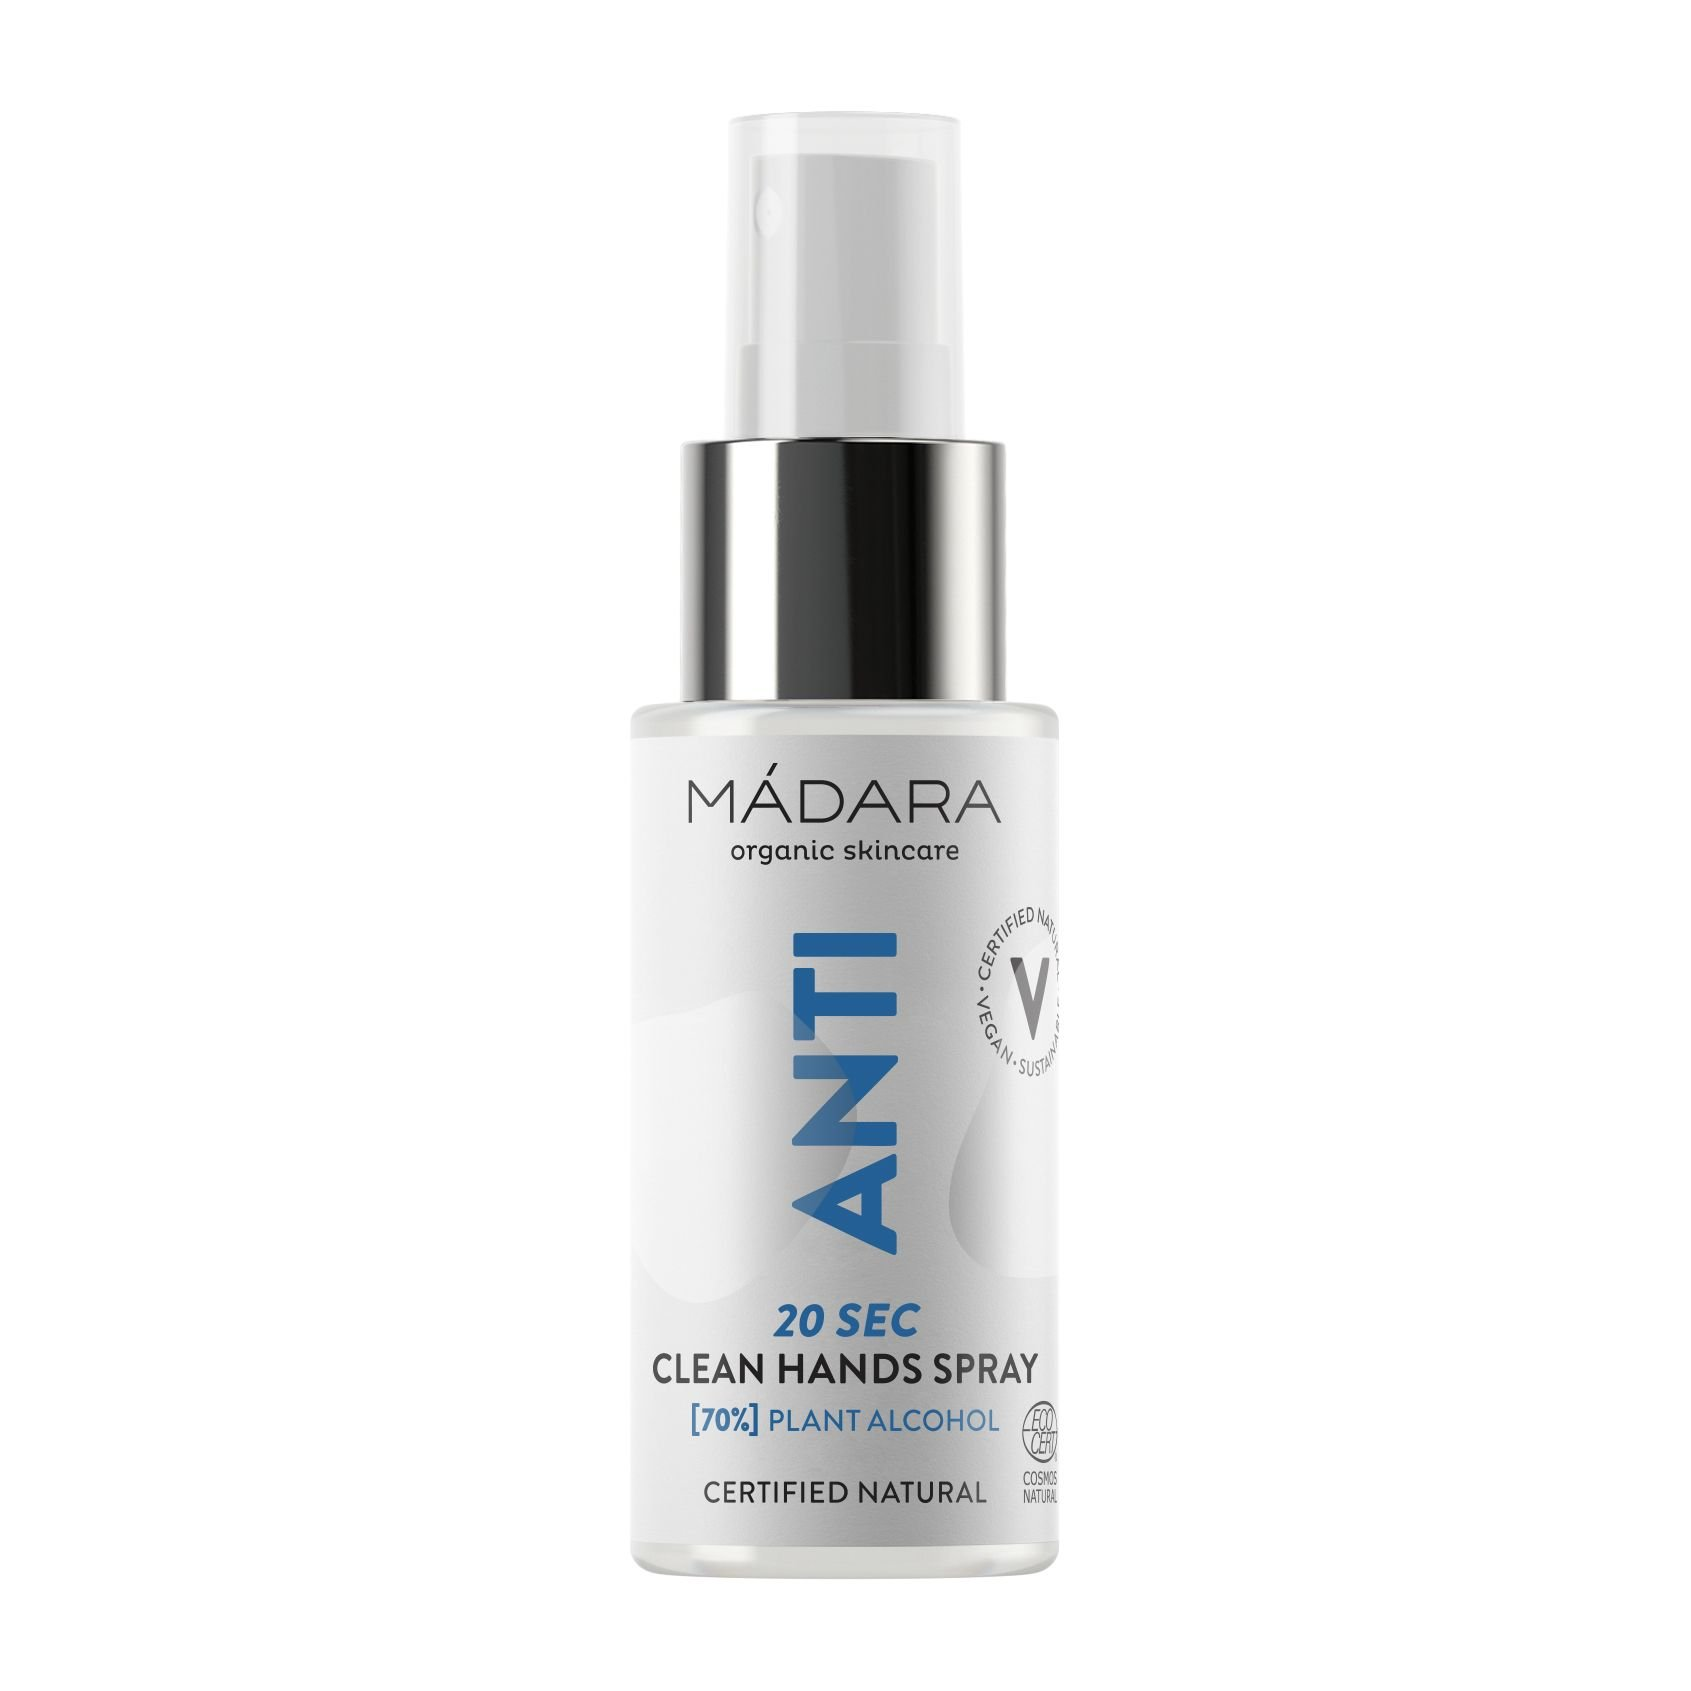 Mádara - Anti 20 Sec Clean Hands Spray